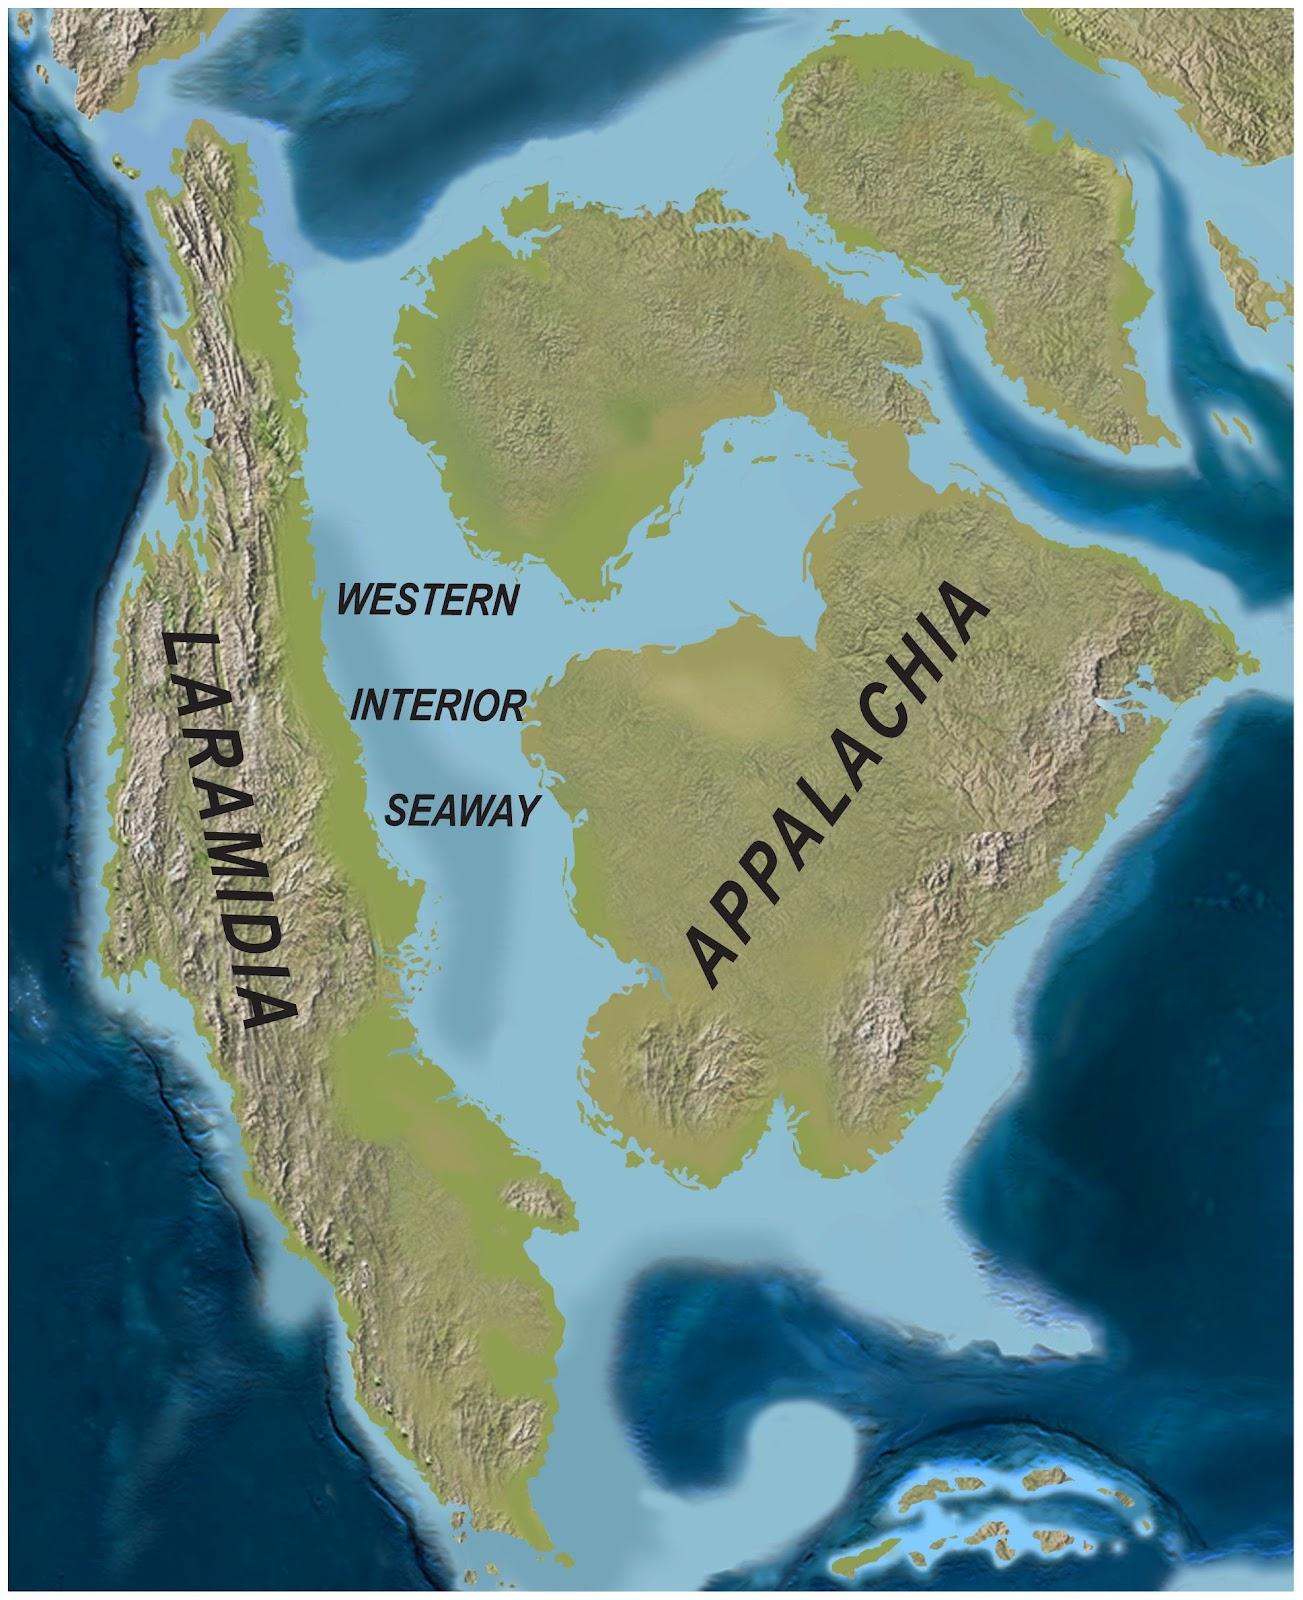 Островной контитент Ларамидия— место обитания тираннозавра